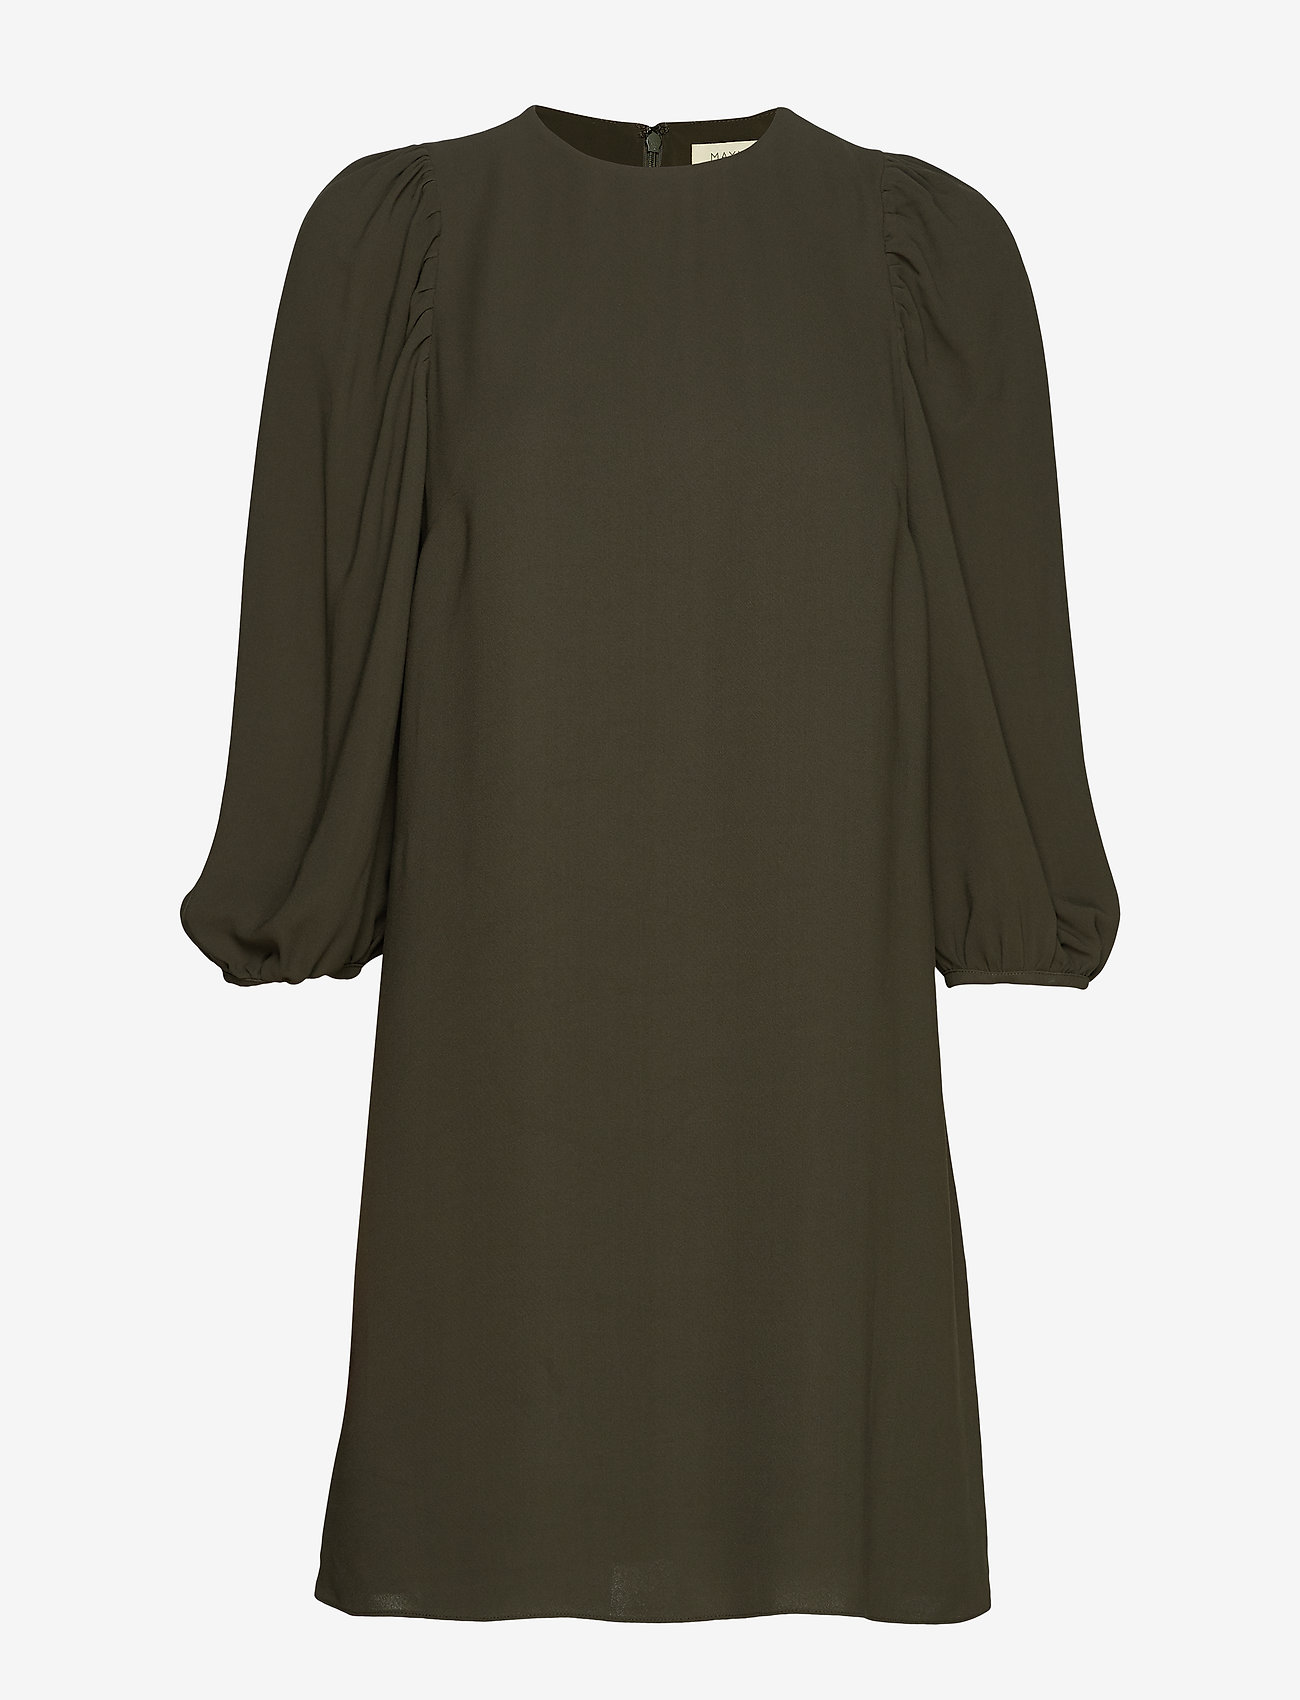 Bea Puff Sleeve Dress (Moss) - Mayla Stockholm 6PZR7f